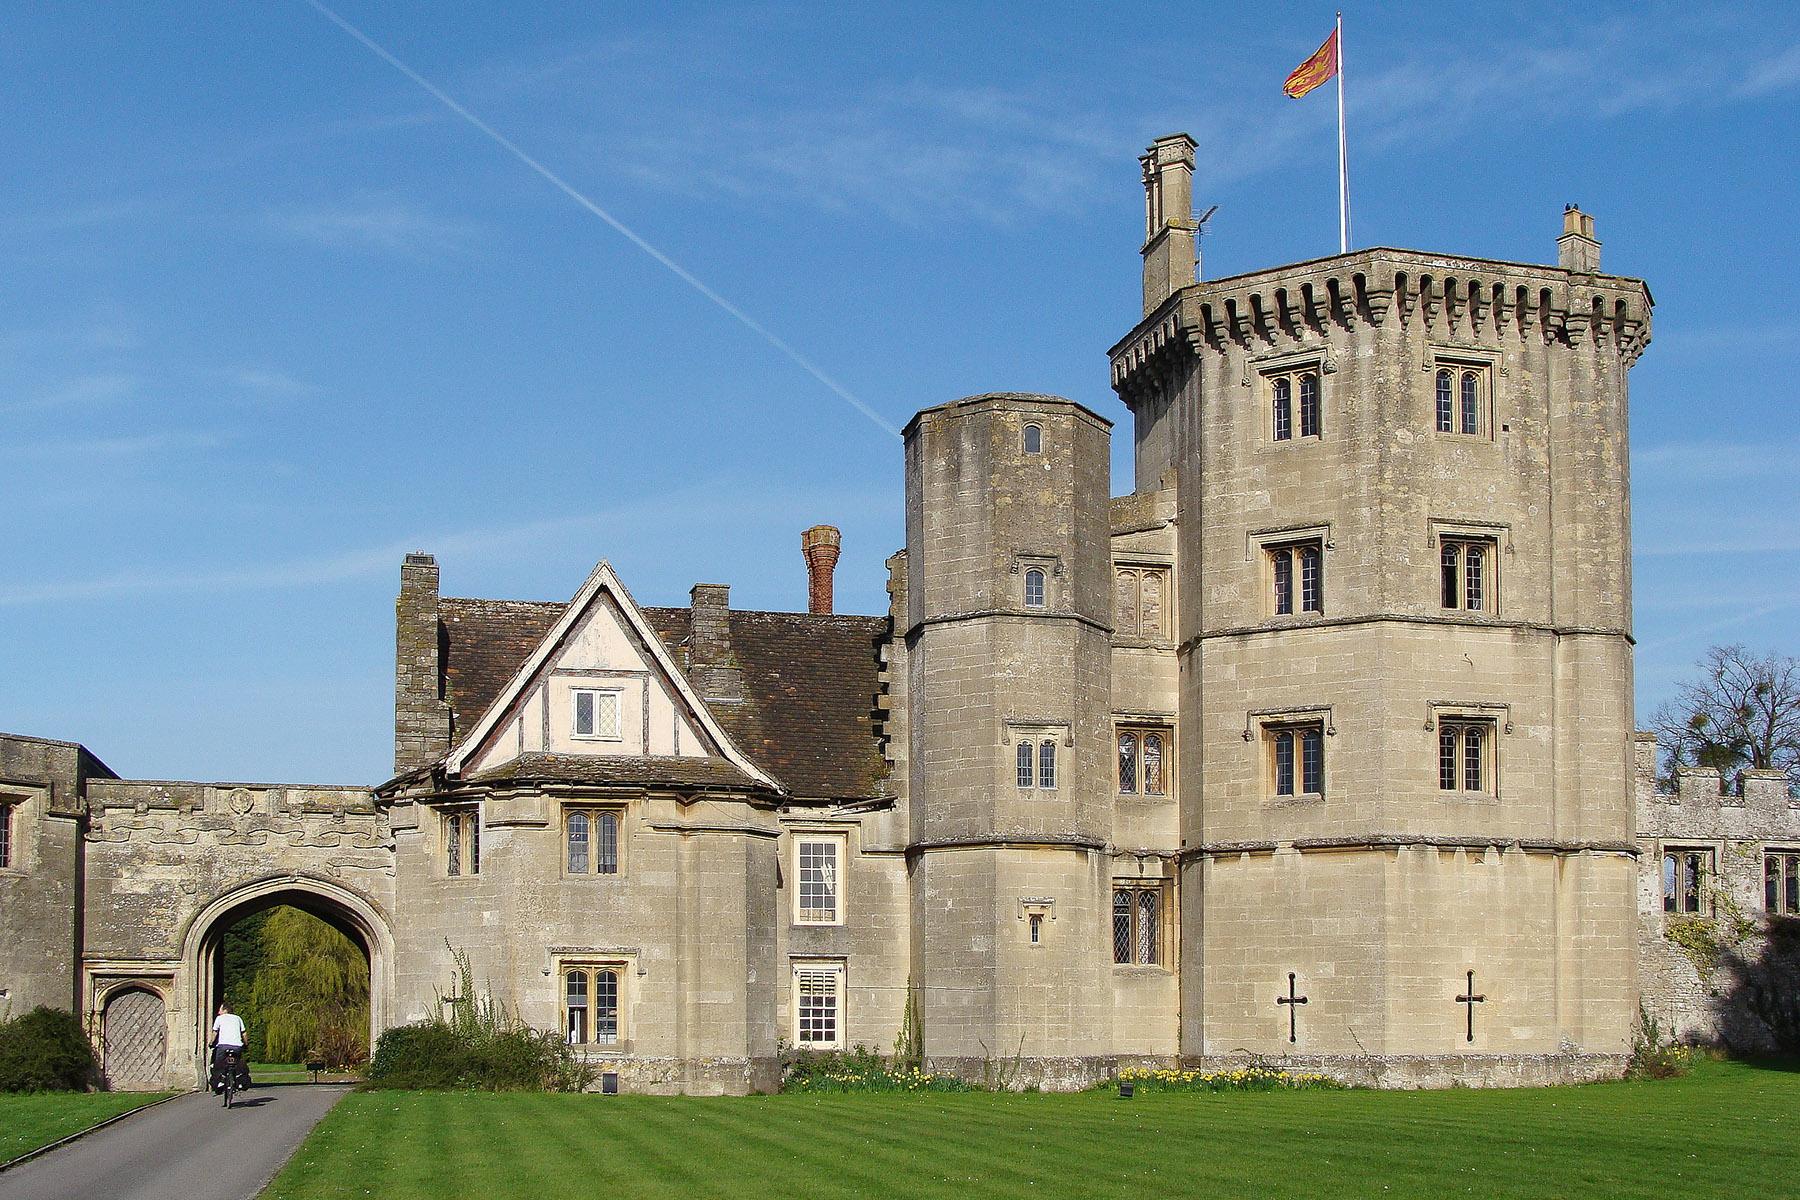 Thornbury Castle, England